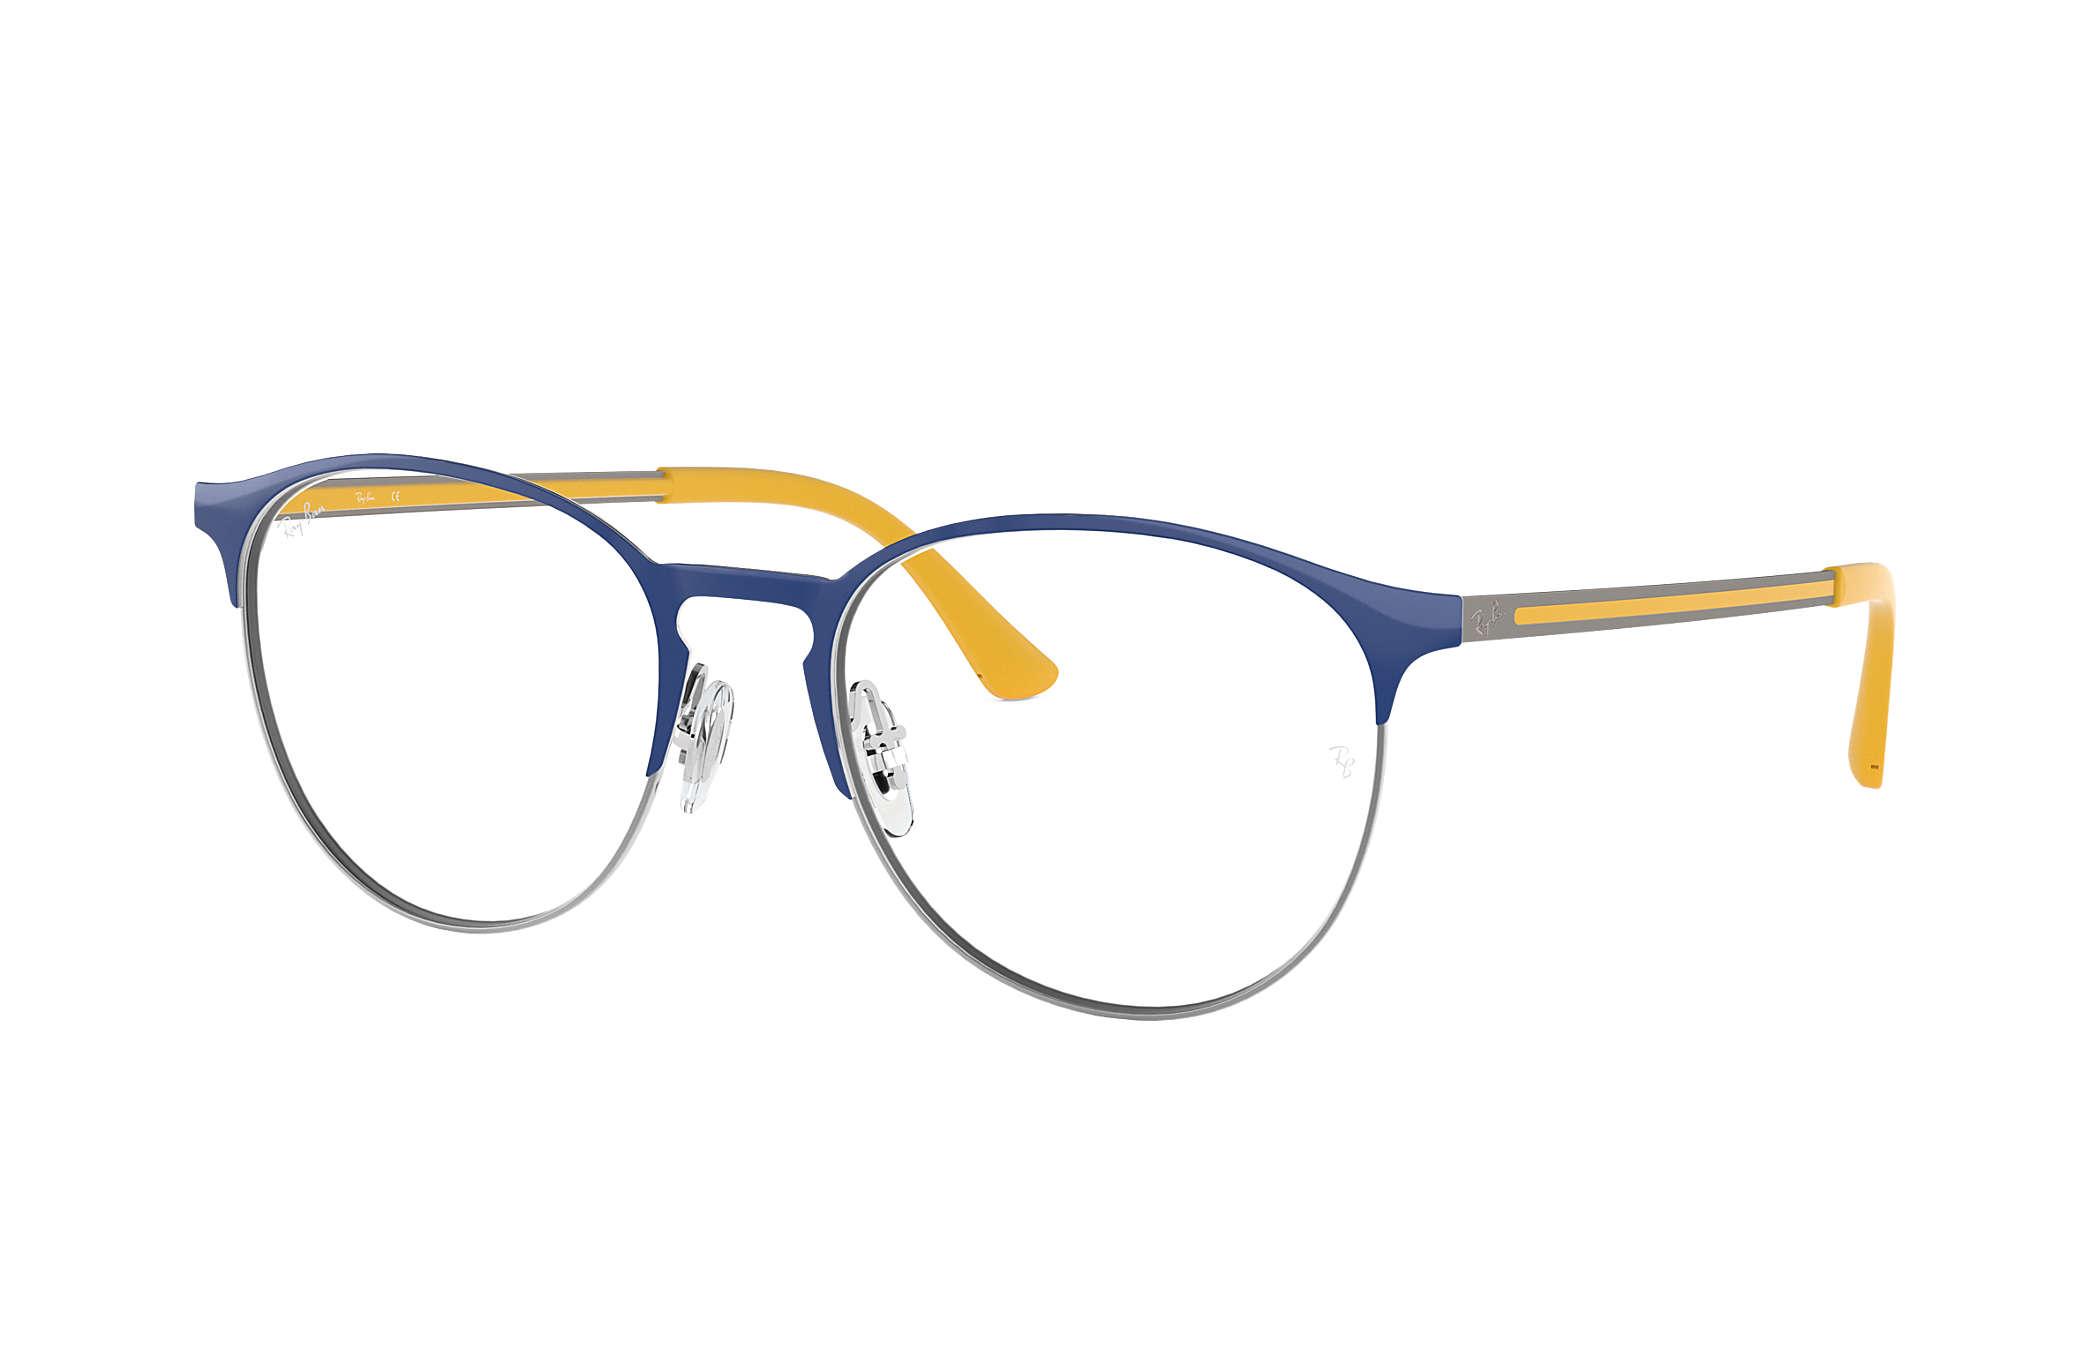 71dffa1753 Ray-Ban prescription glasses RB6375 Blue - Metal - 0RX6375295053 ...